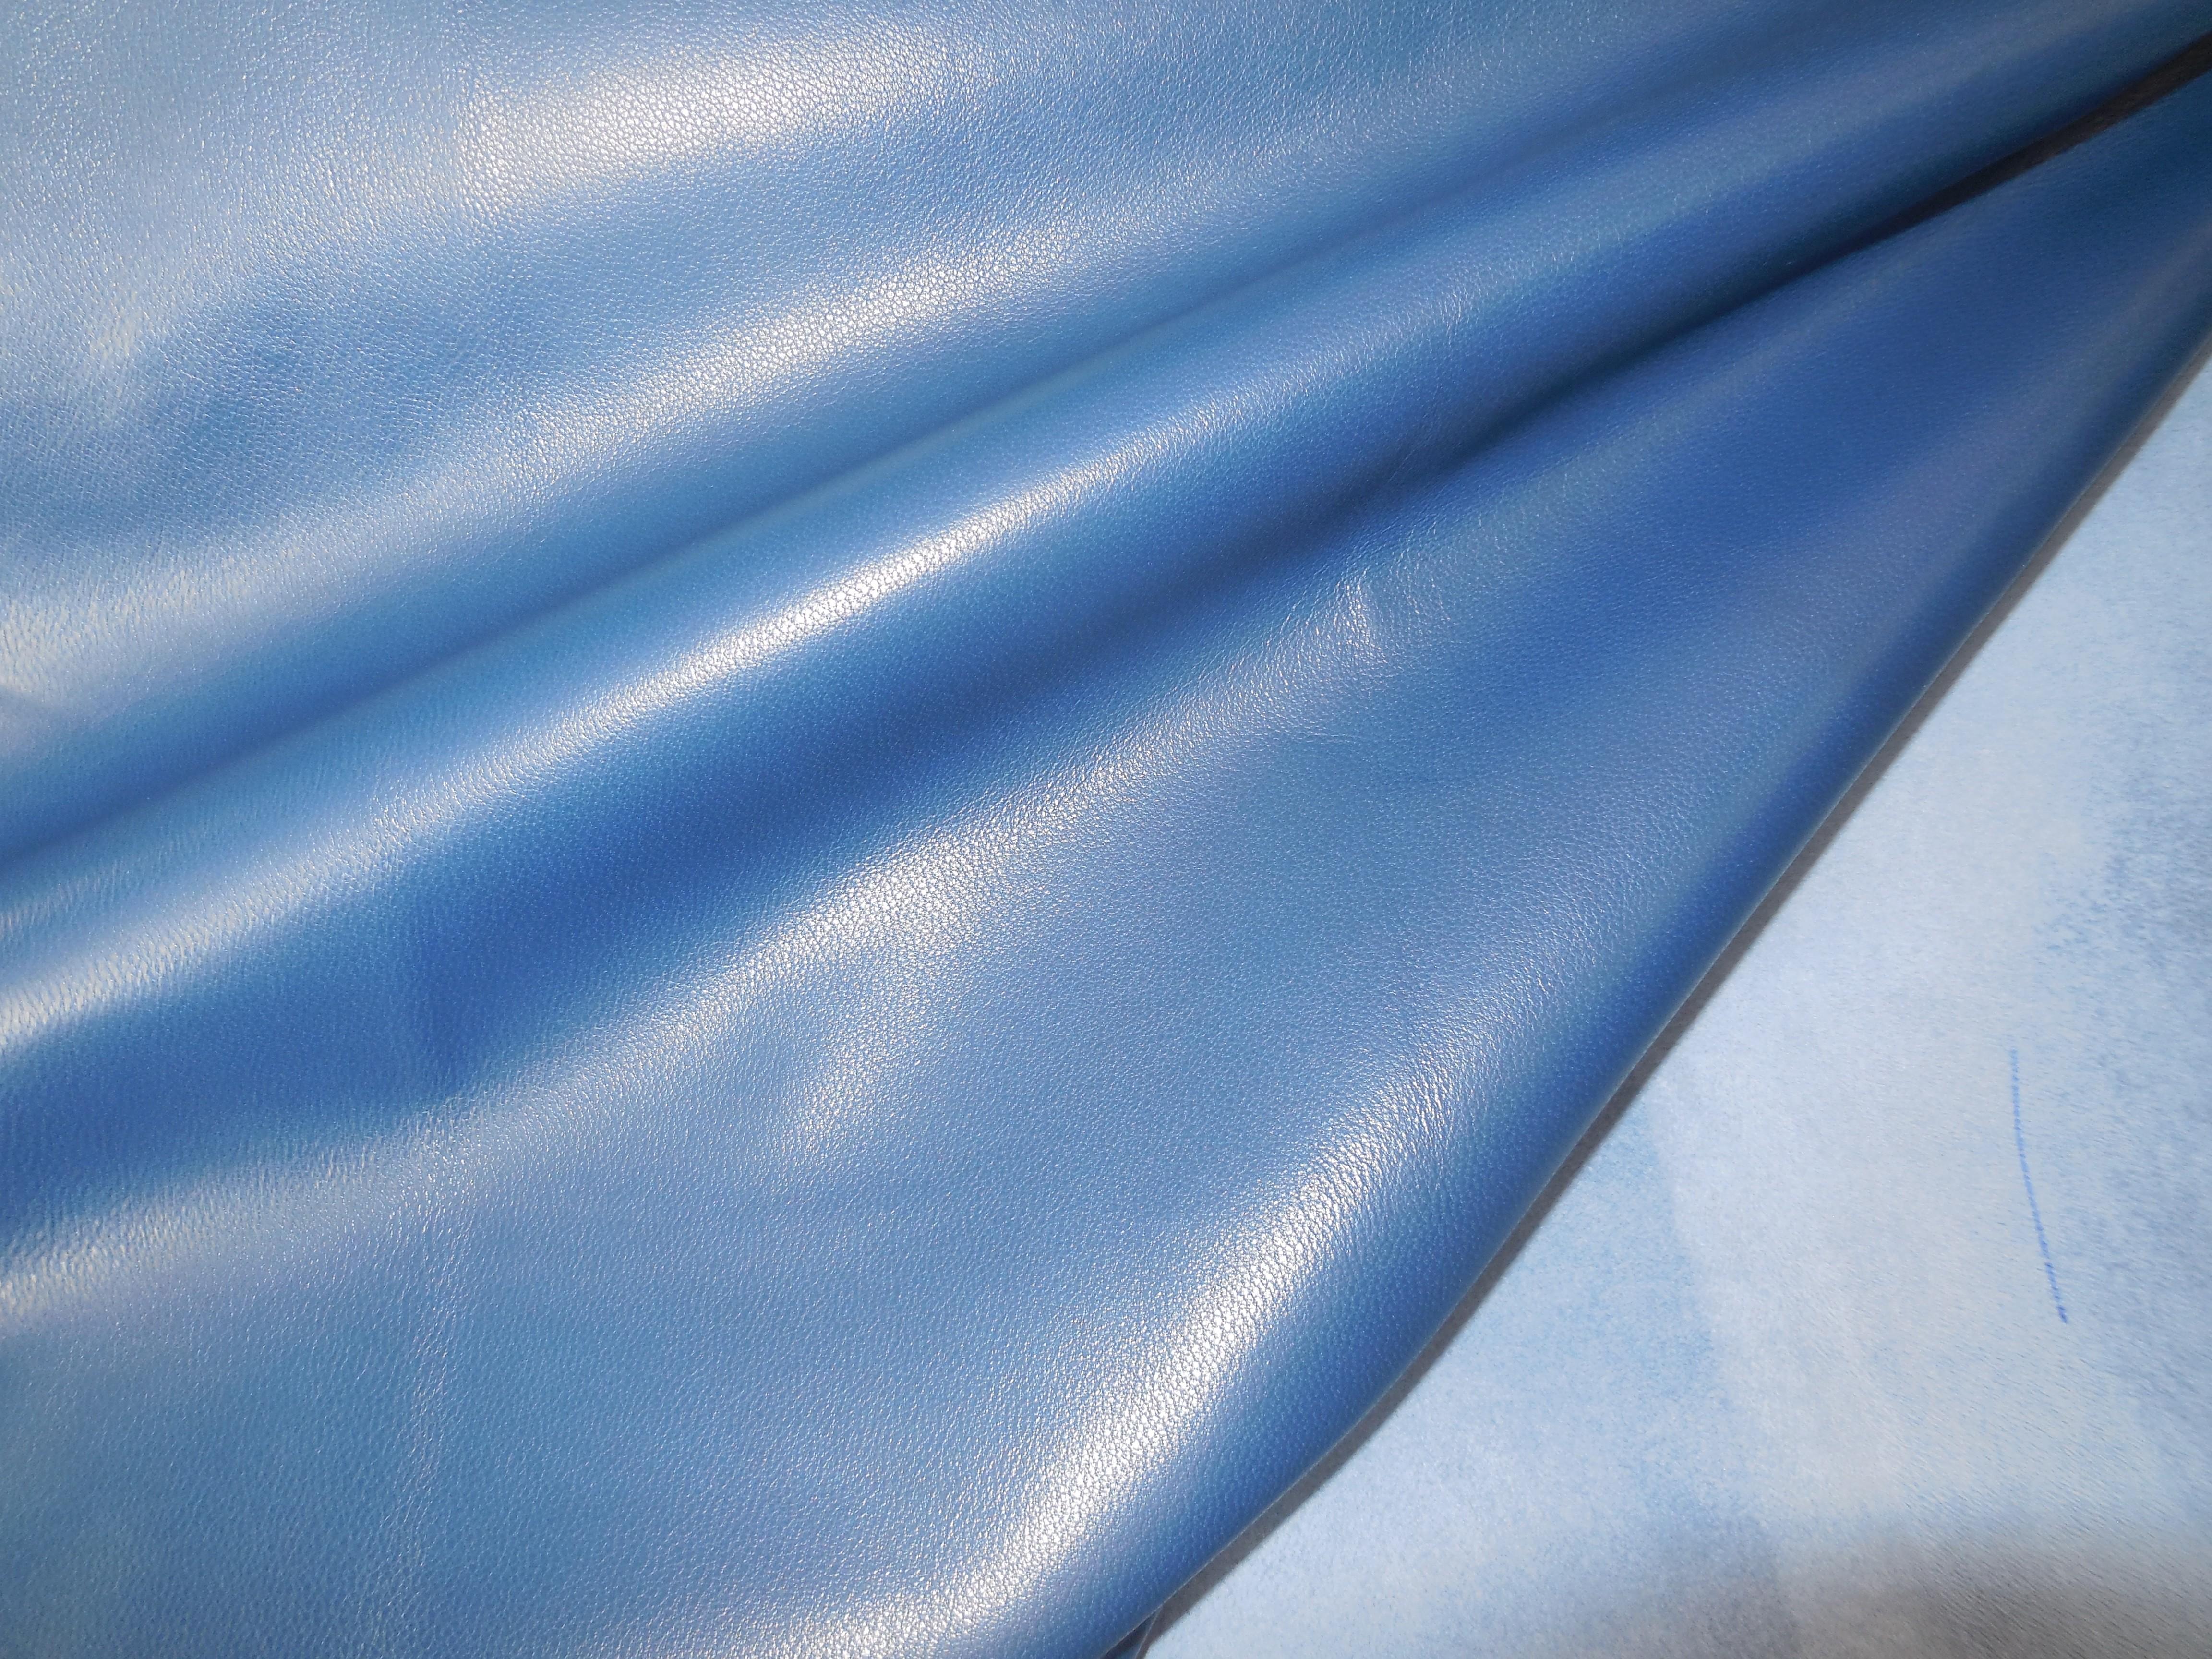 Skóra naturalna odzieżowa, licowa granatowa-Spodnica ze skóry naturalnej granatowa -  Granatowa sukienka ze skóry naturalnej , Skora naturalna granatowa cienka_ skóra naturalna odziezowa granatowa- Skora naturalna odzieżowa granatowa - sprzedaż skór natur